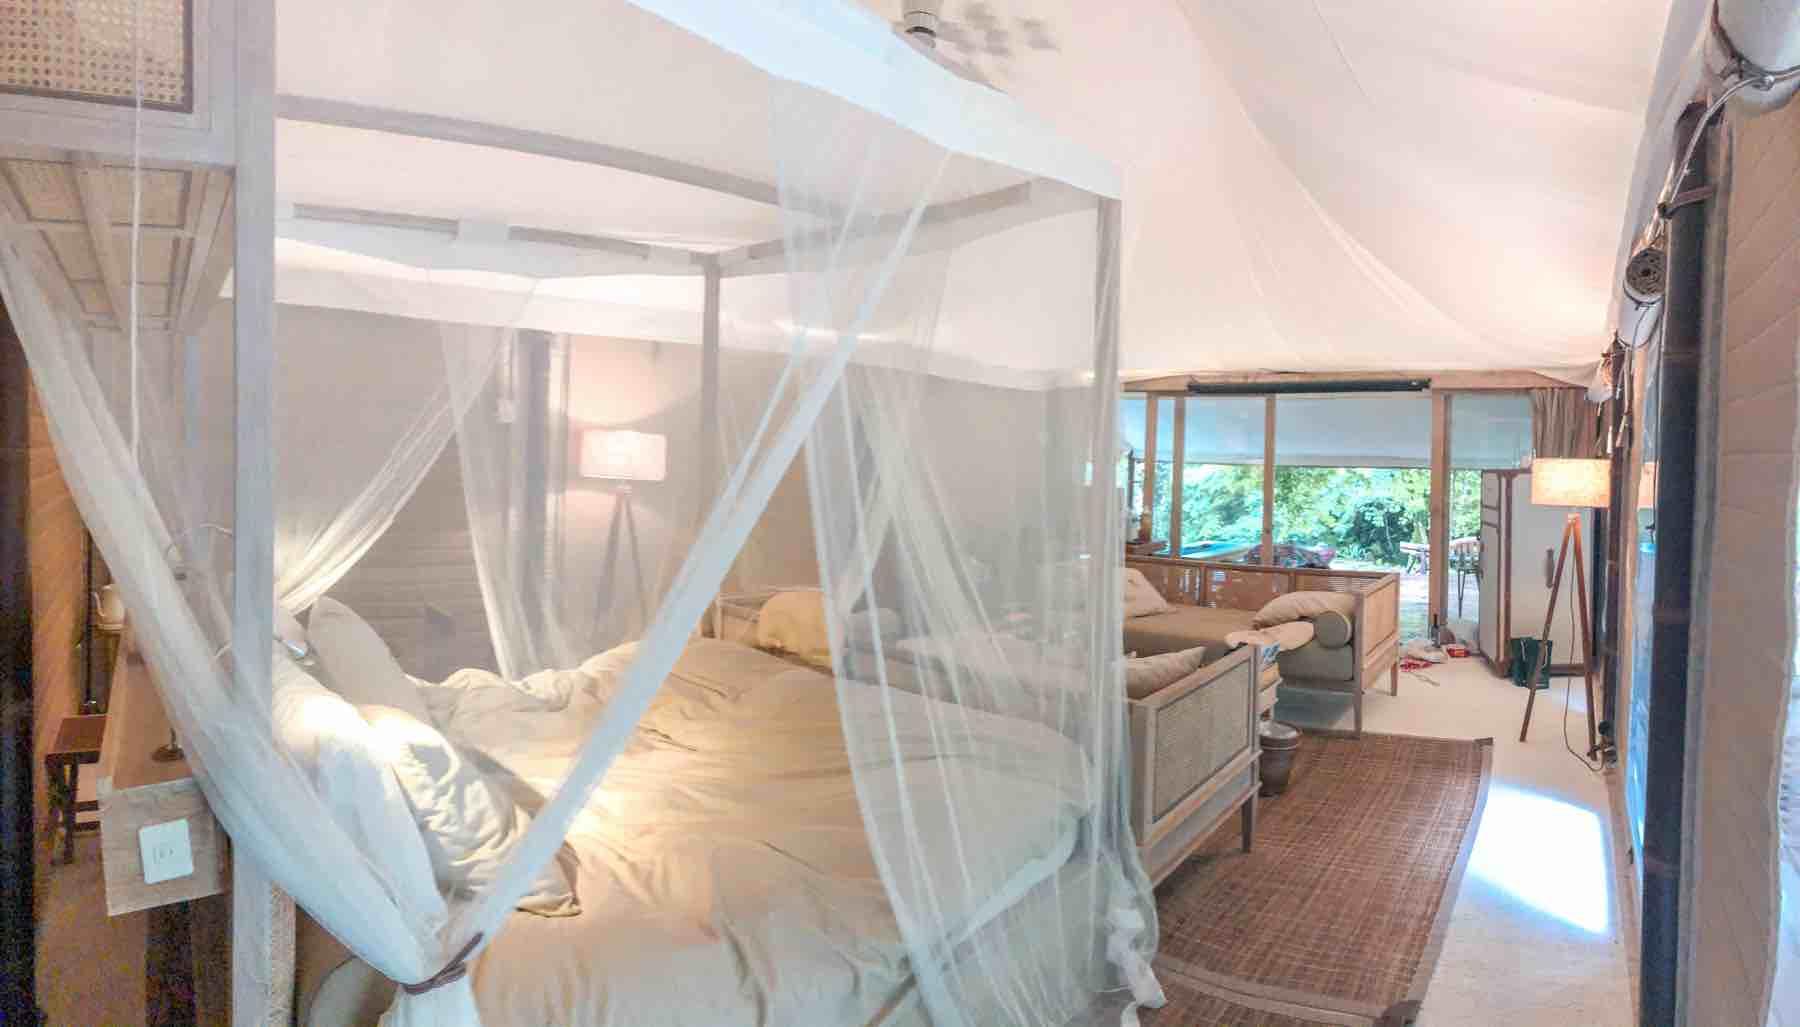 KEIKOKU GLAMPINGのスイートテントのベッド